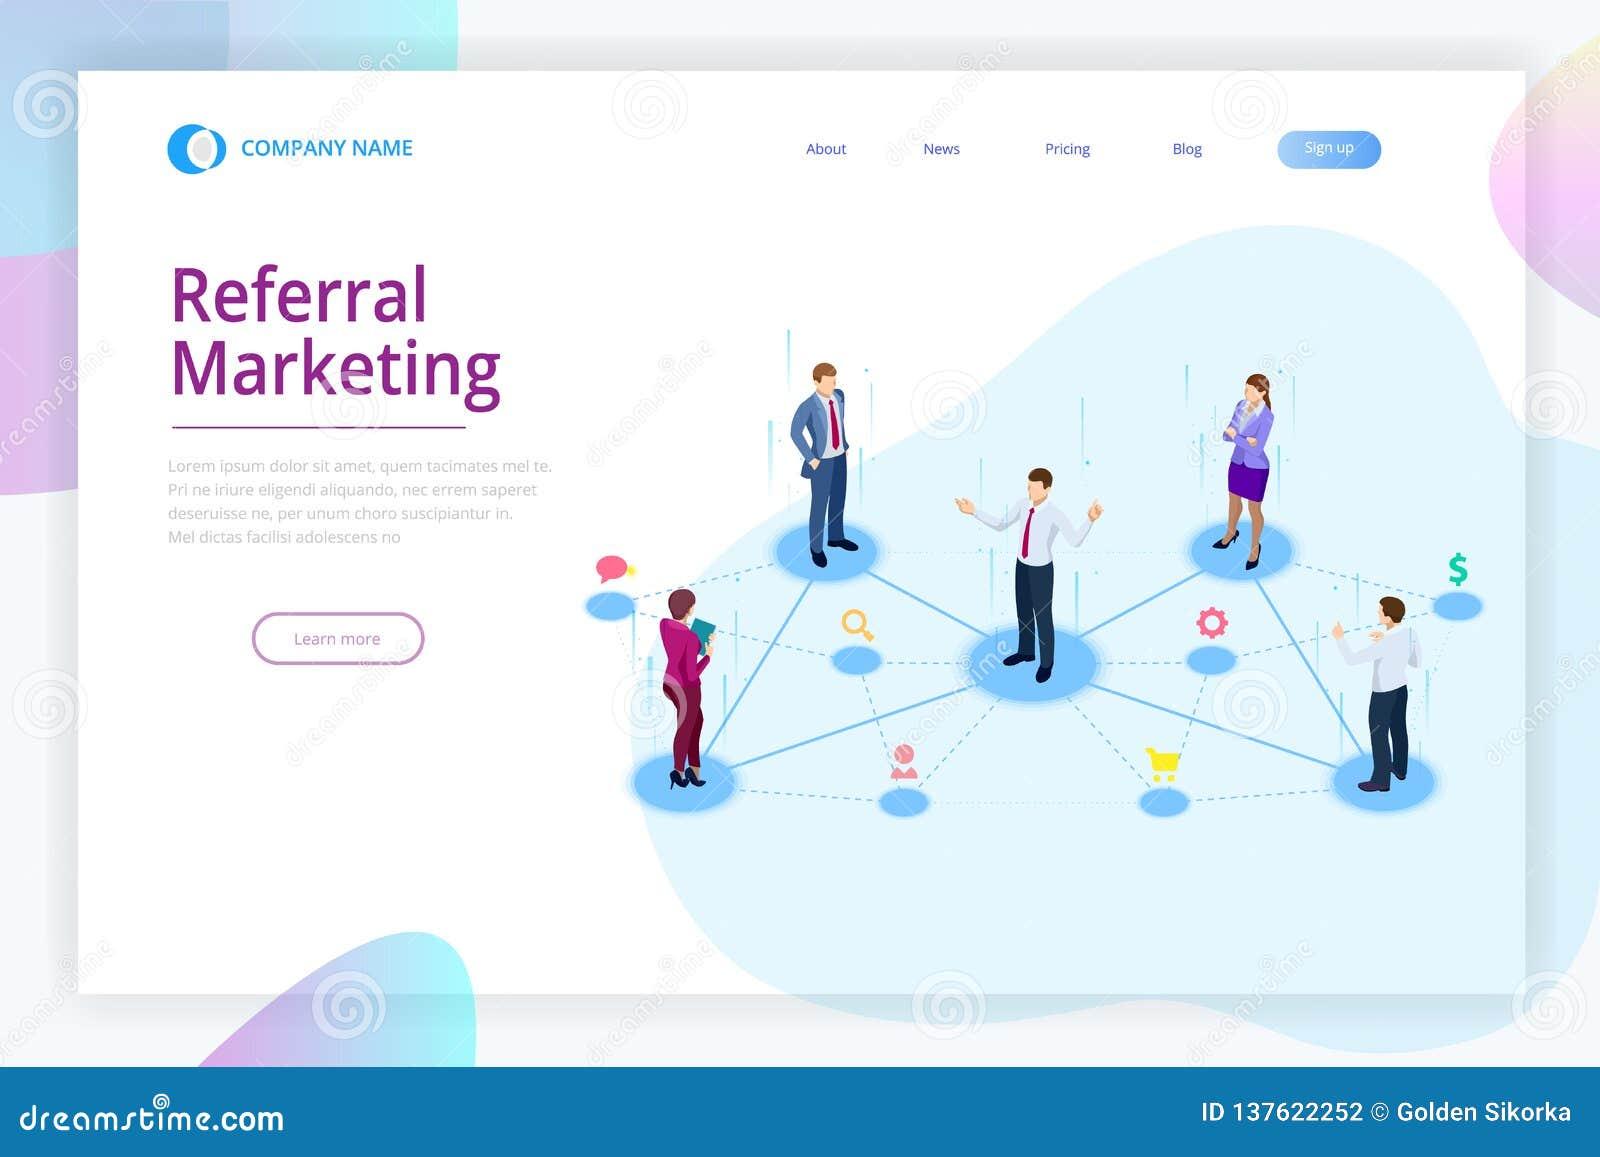 Isometric Referral Marketing, Network Marketing, Referral